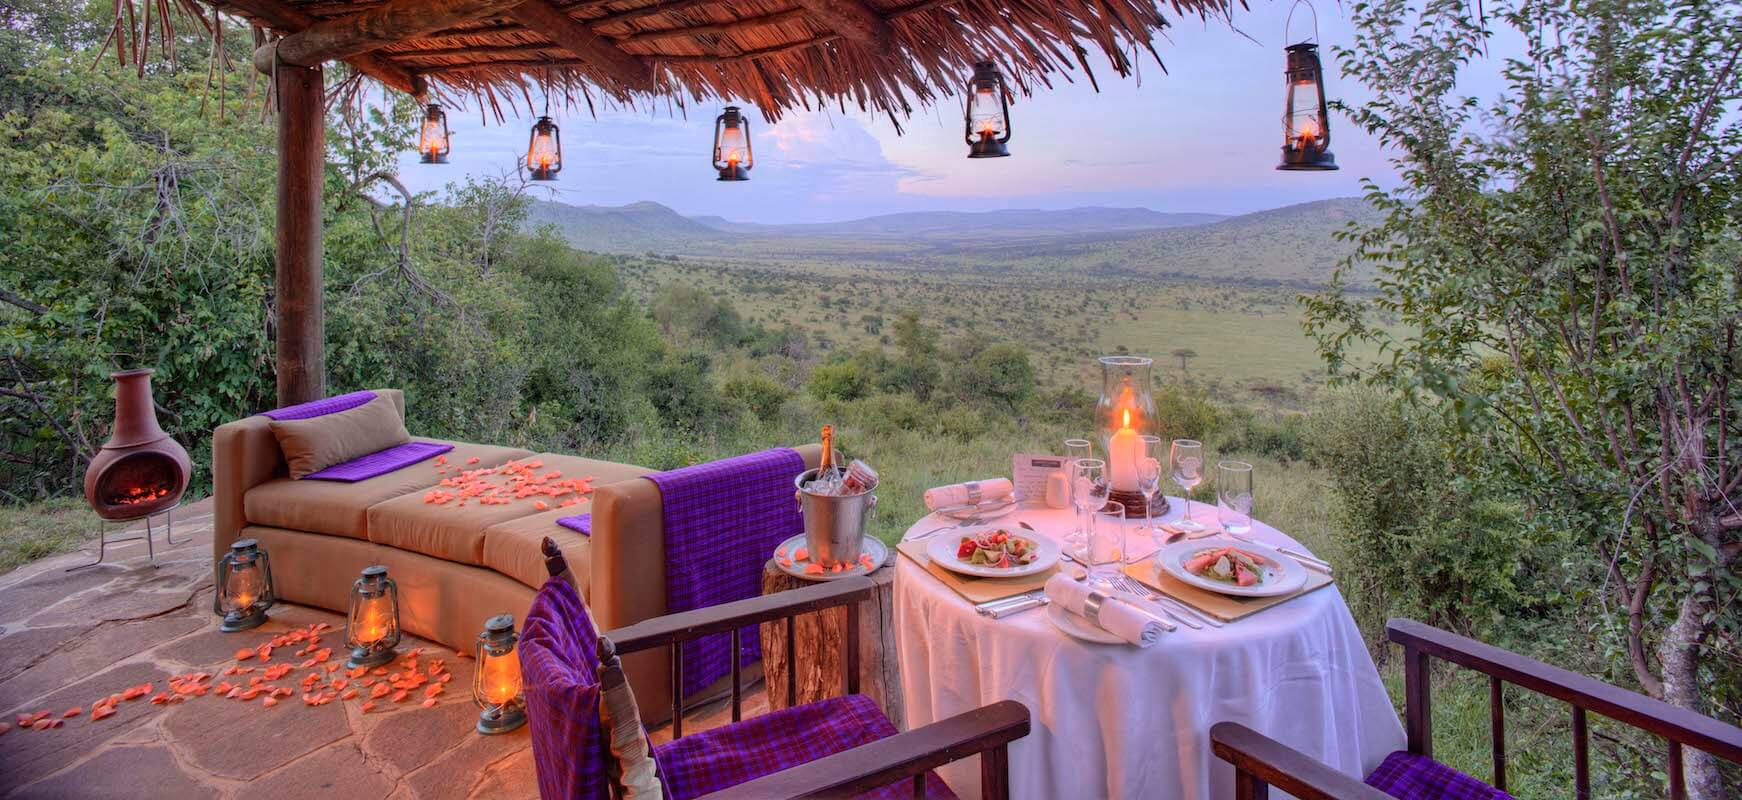 Tanzania_NorthSerengeti__Beyond Kleins Private Dining